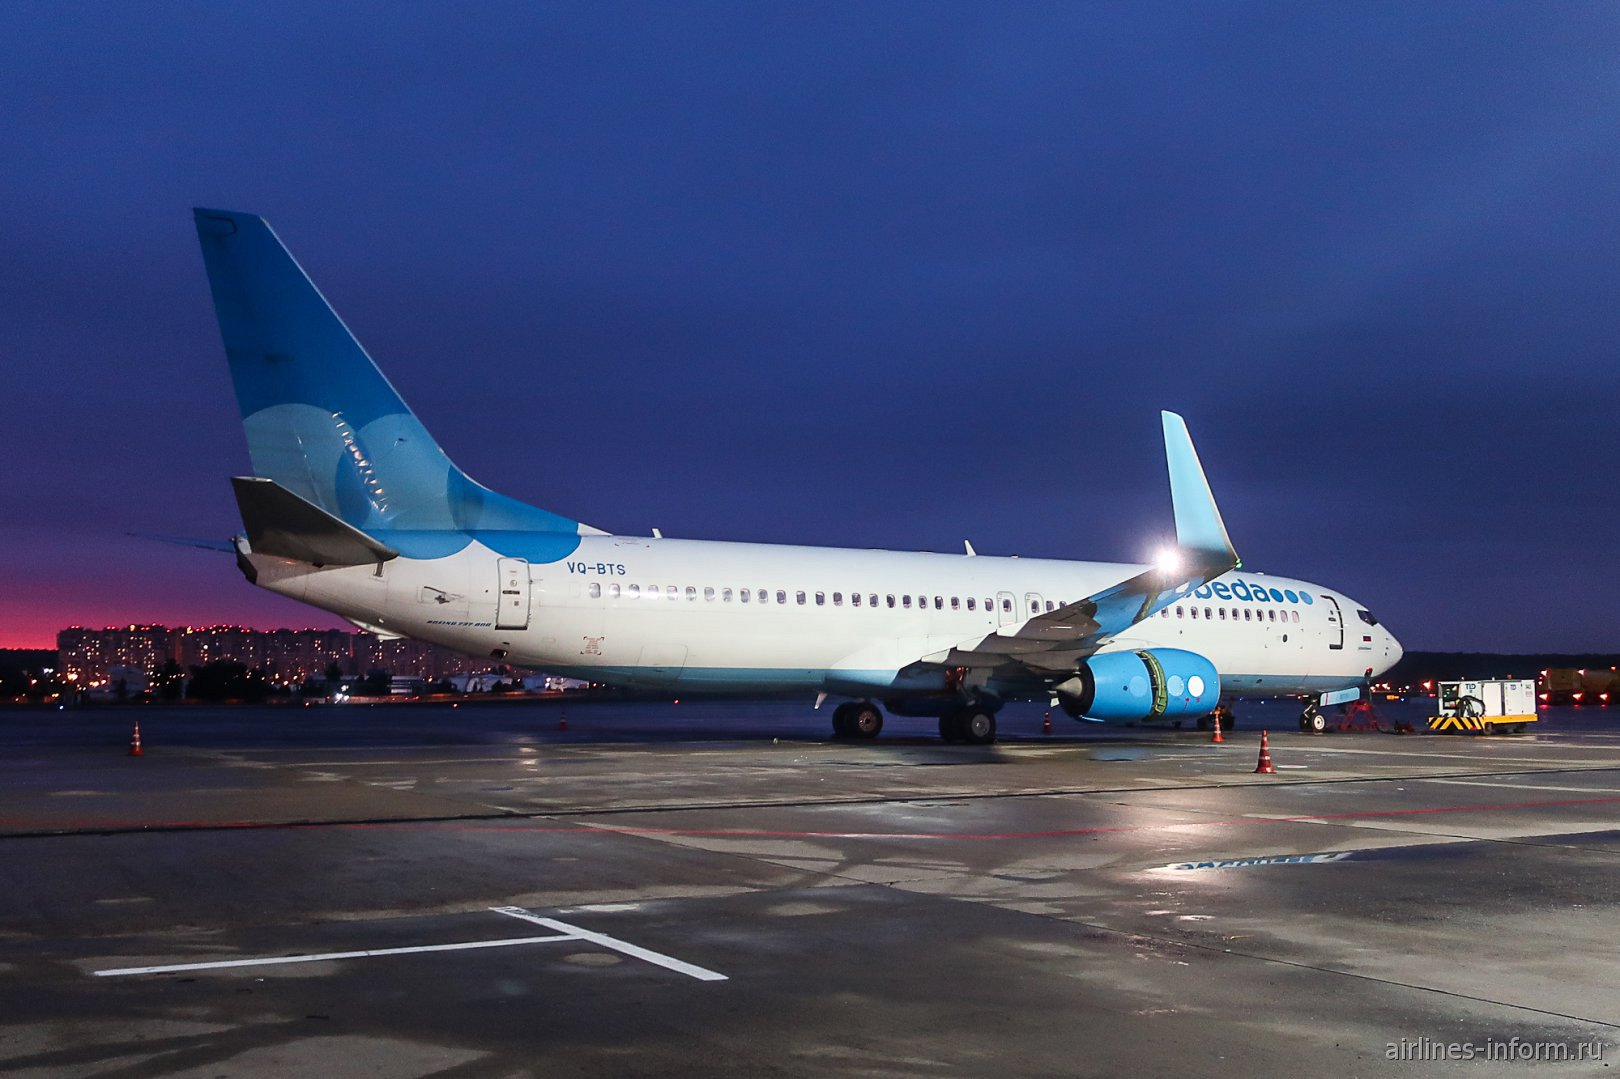 Боинг-737-800 VQ-BTS авиакомпании